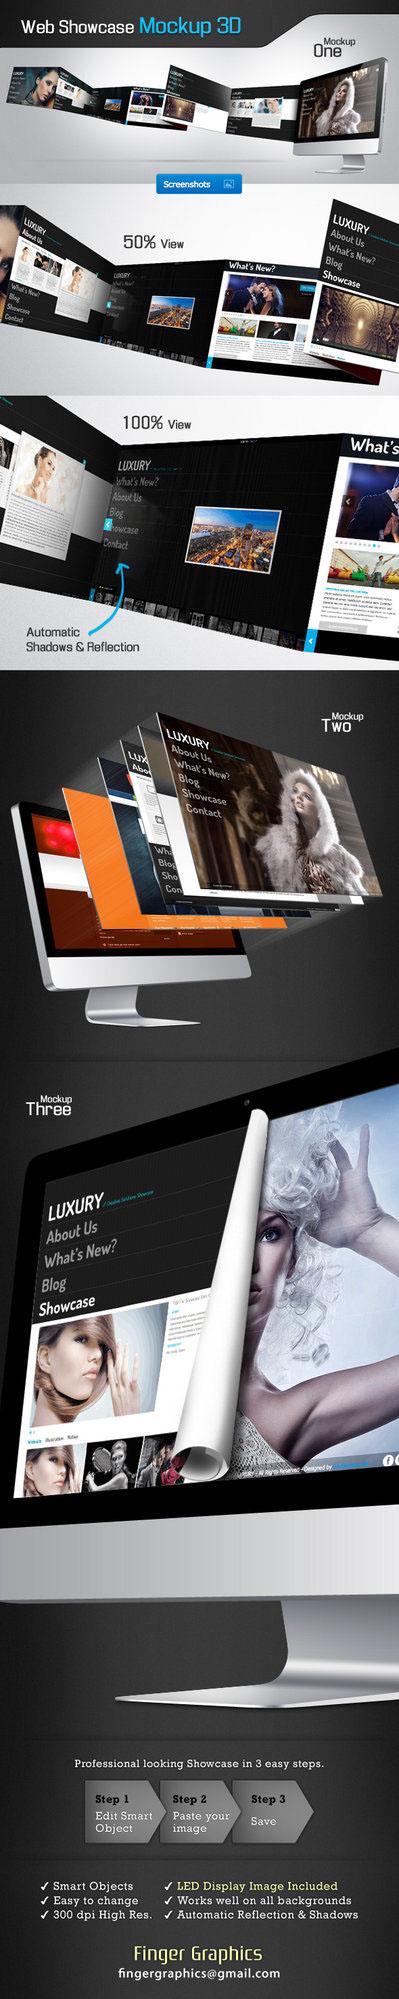 Webdesign  photoshop  mockup graphicriver presentation Web